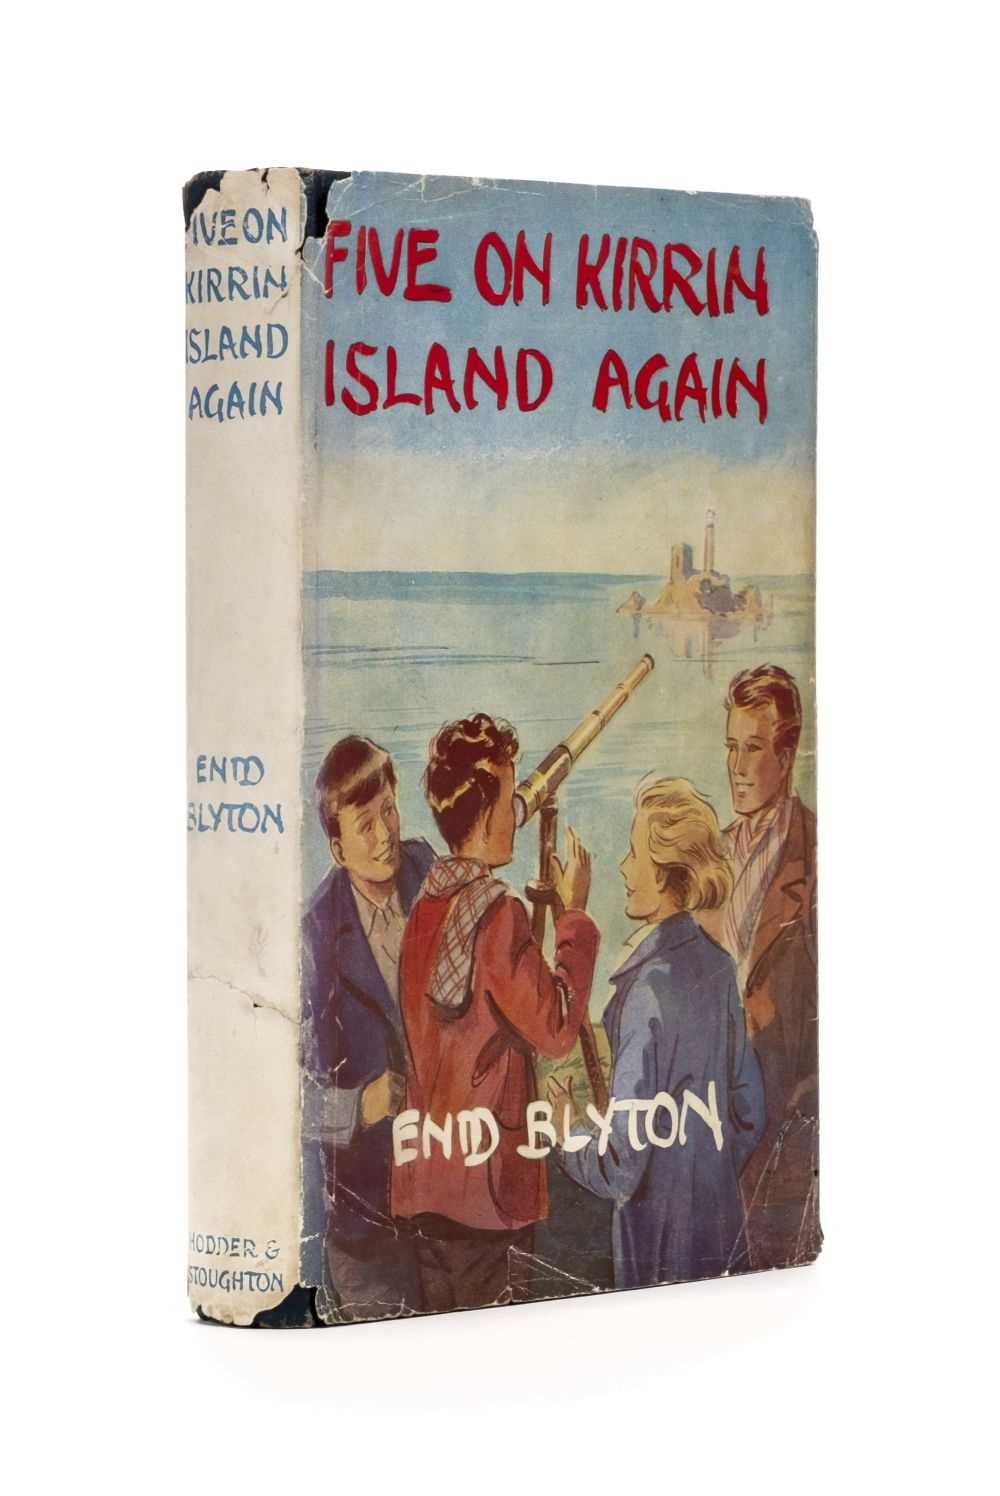 Lot 595 - Blyton (Enid). Five on Kirrin Island Again, 1st edition, Hodder & Stoughton, 1947